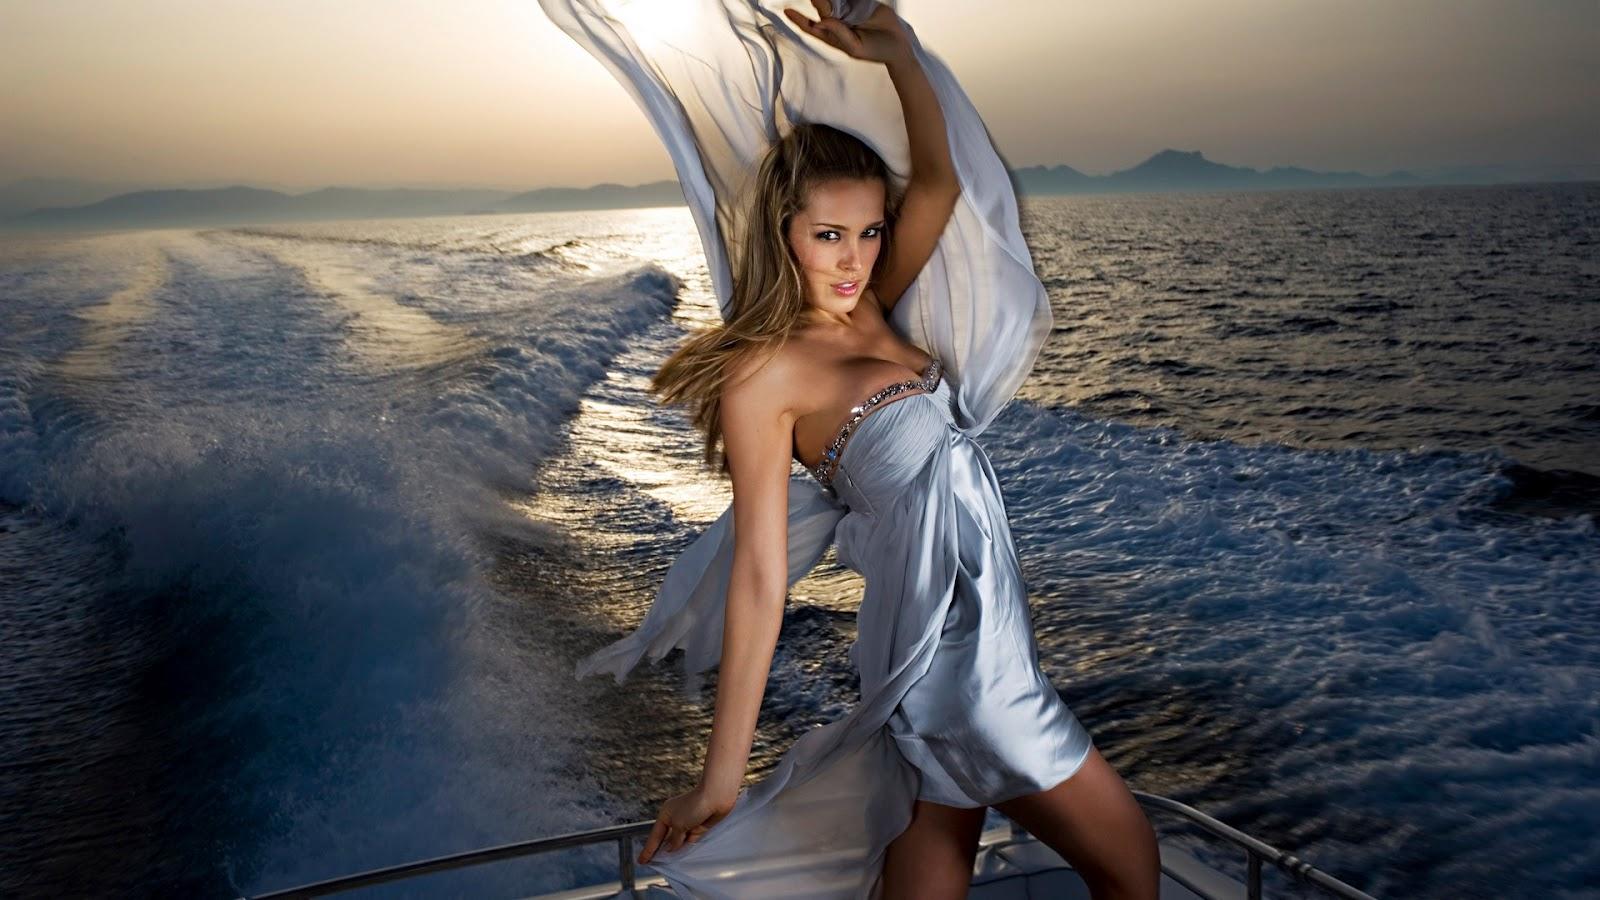 http://3.bp.blogspot.com/-eVV0eQhxydc/T4_4EOSYY8I/AAAAAAAAABI/1scVUXMZfmE/s1600/Petra-Nemcova-yacht-photoshoot-1920x1080.jpg